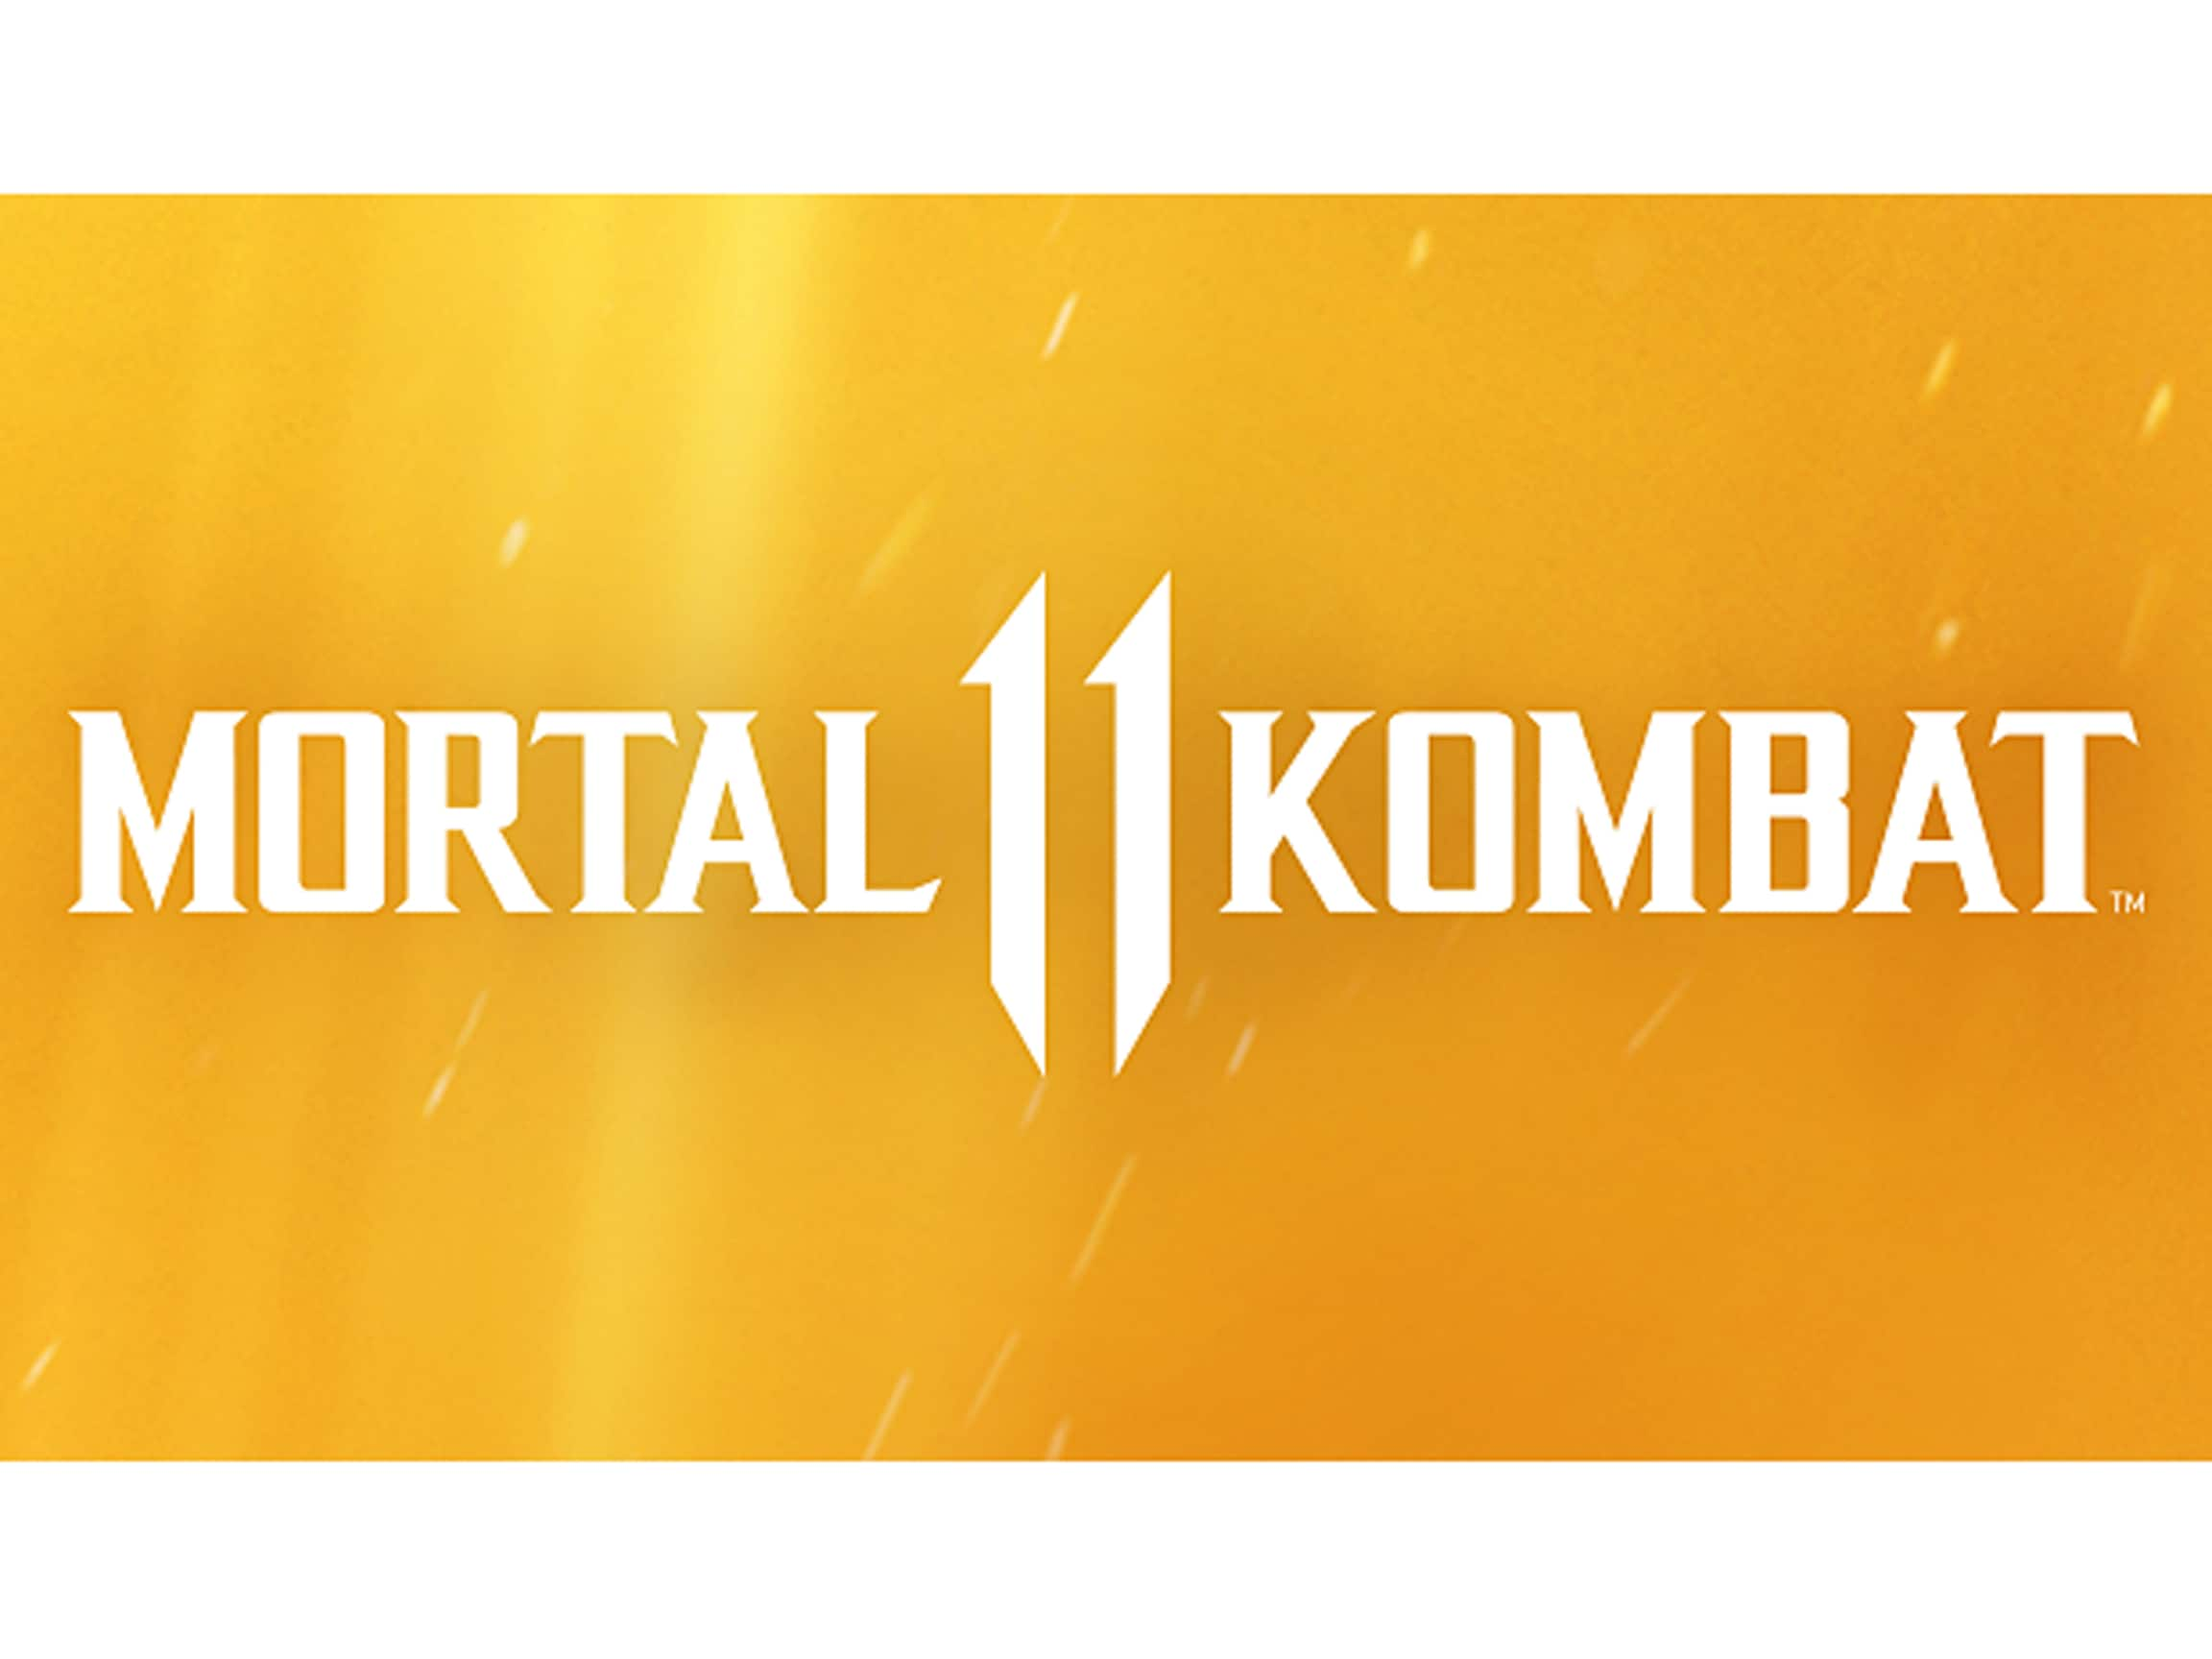 PC Digital Download: Mortal Kombat 11 $43.99